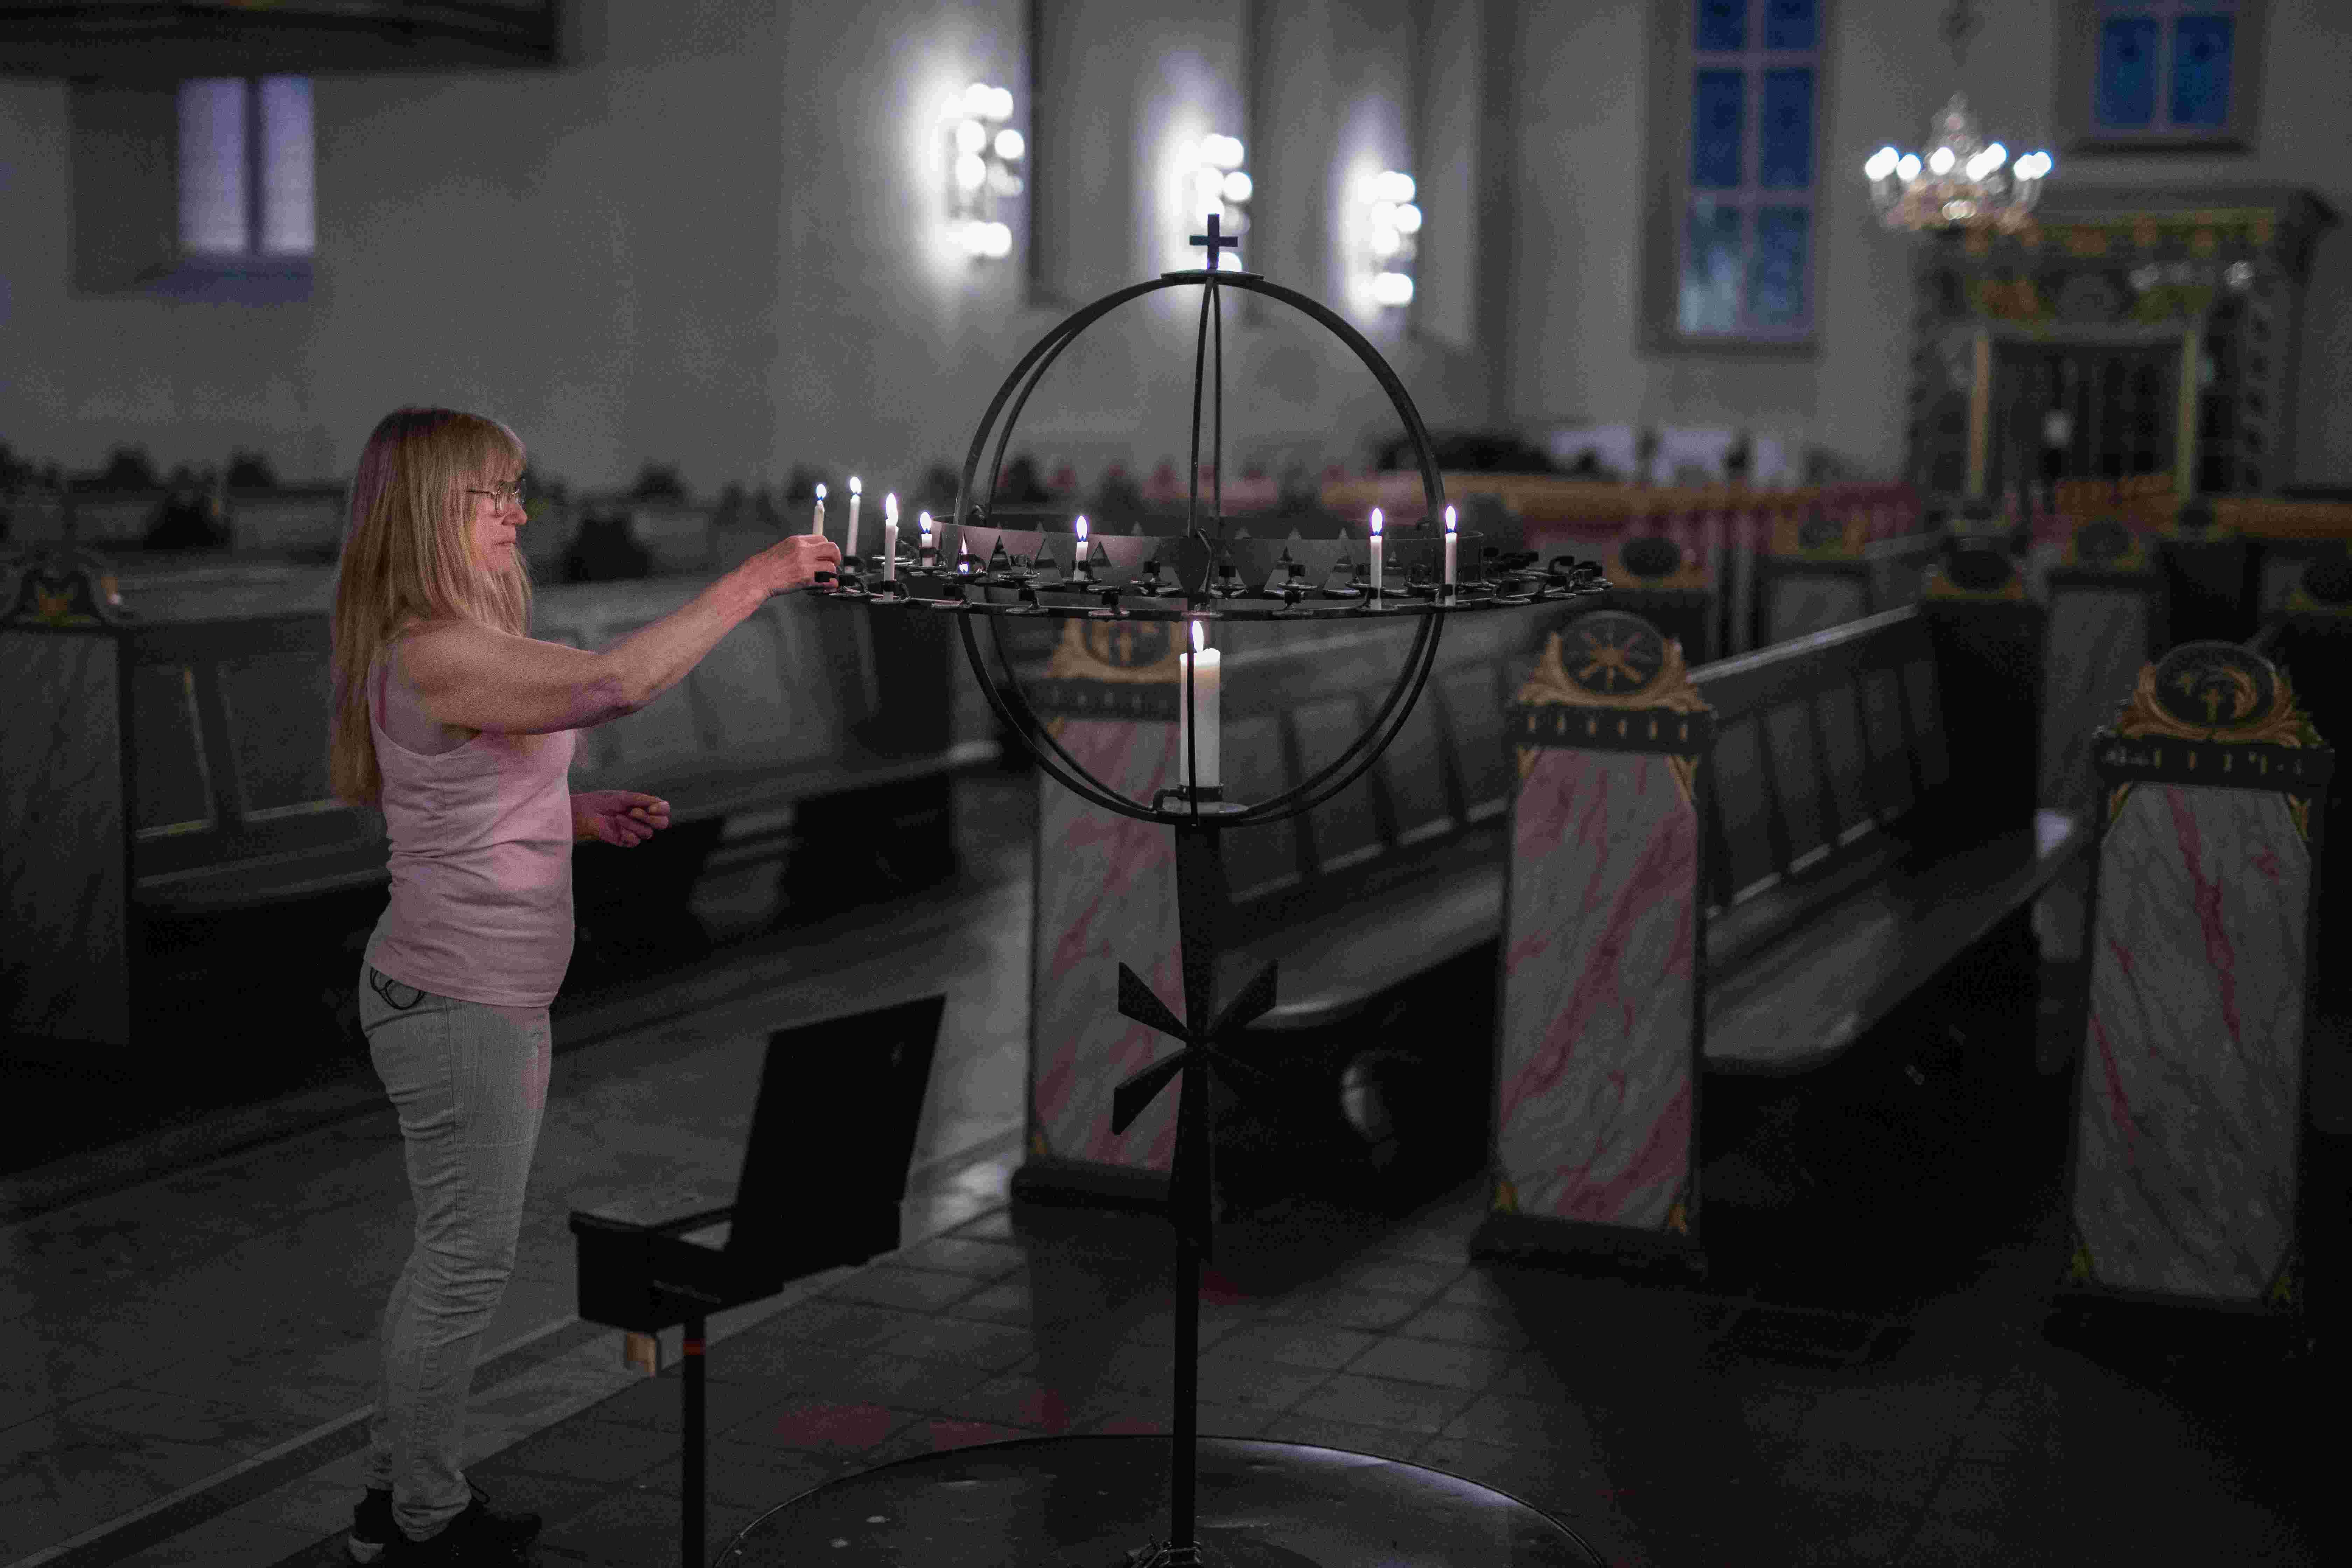 Andrea tenner lys i lysgloben